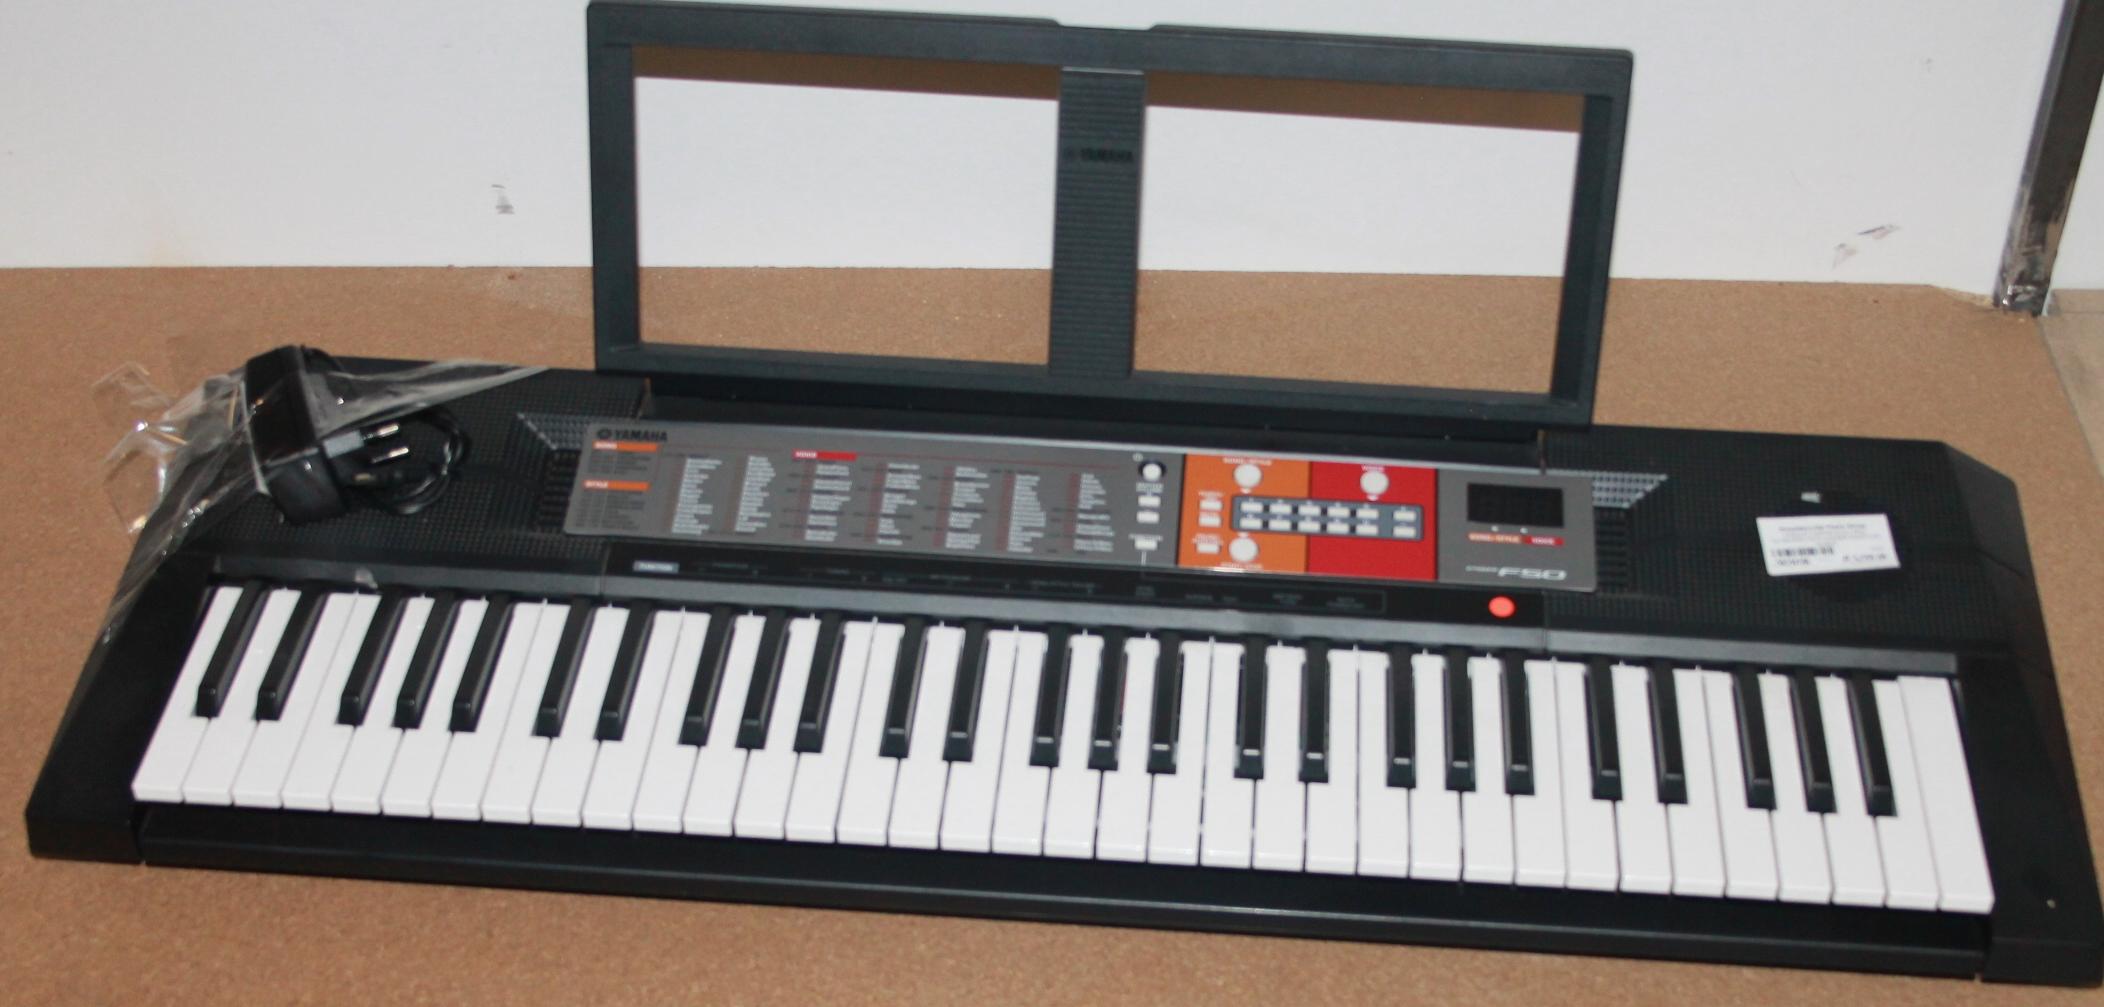 Yamaha keyboard S029419a #Rosettenvillepawnshop